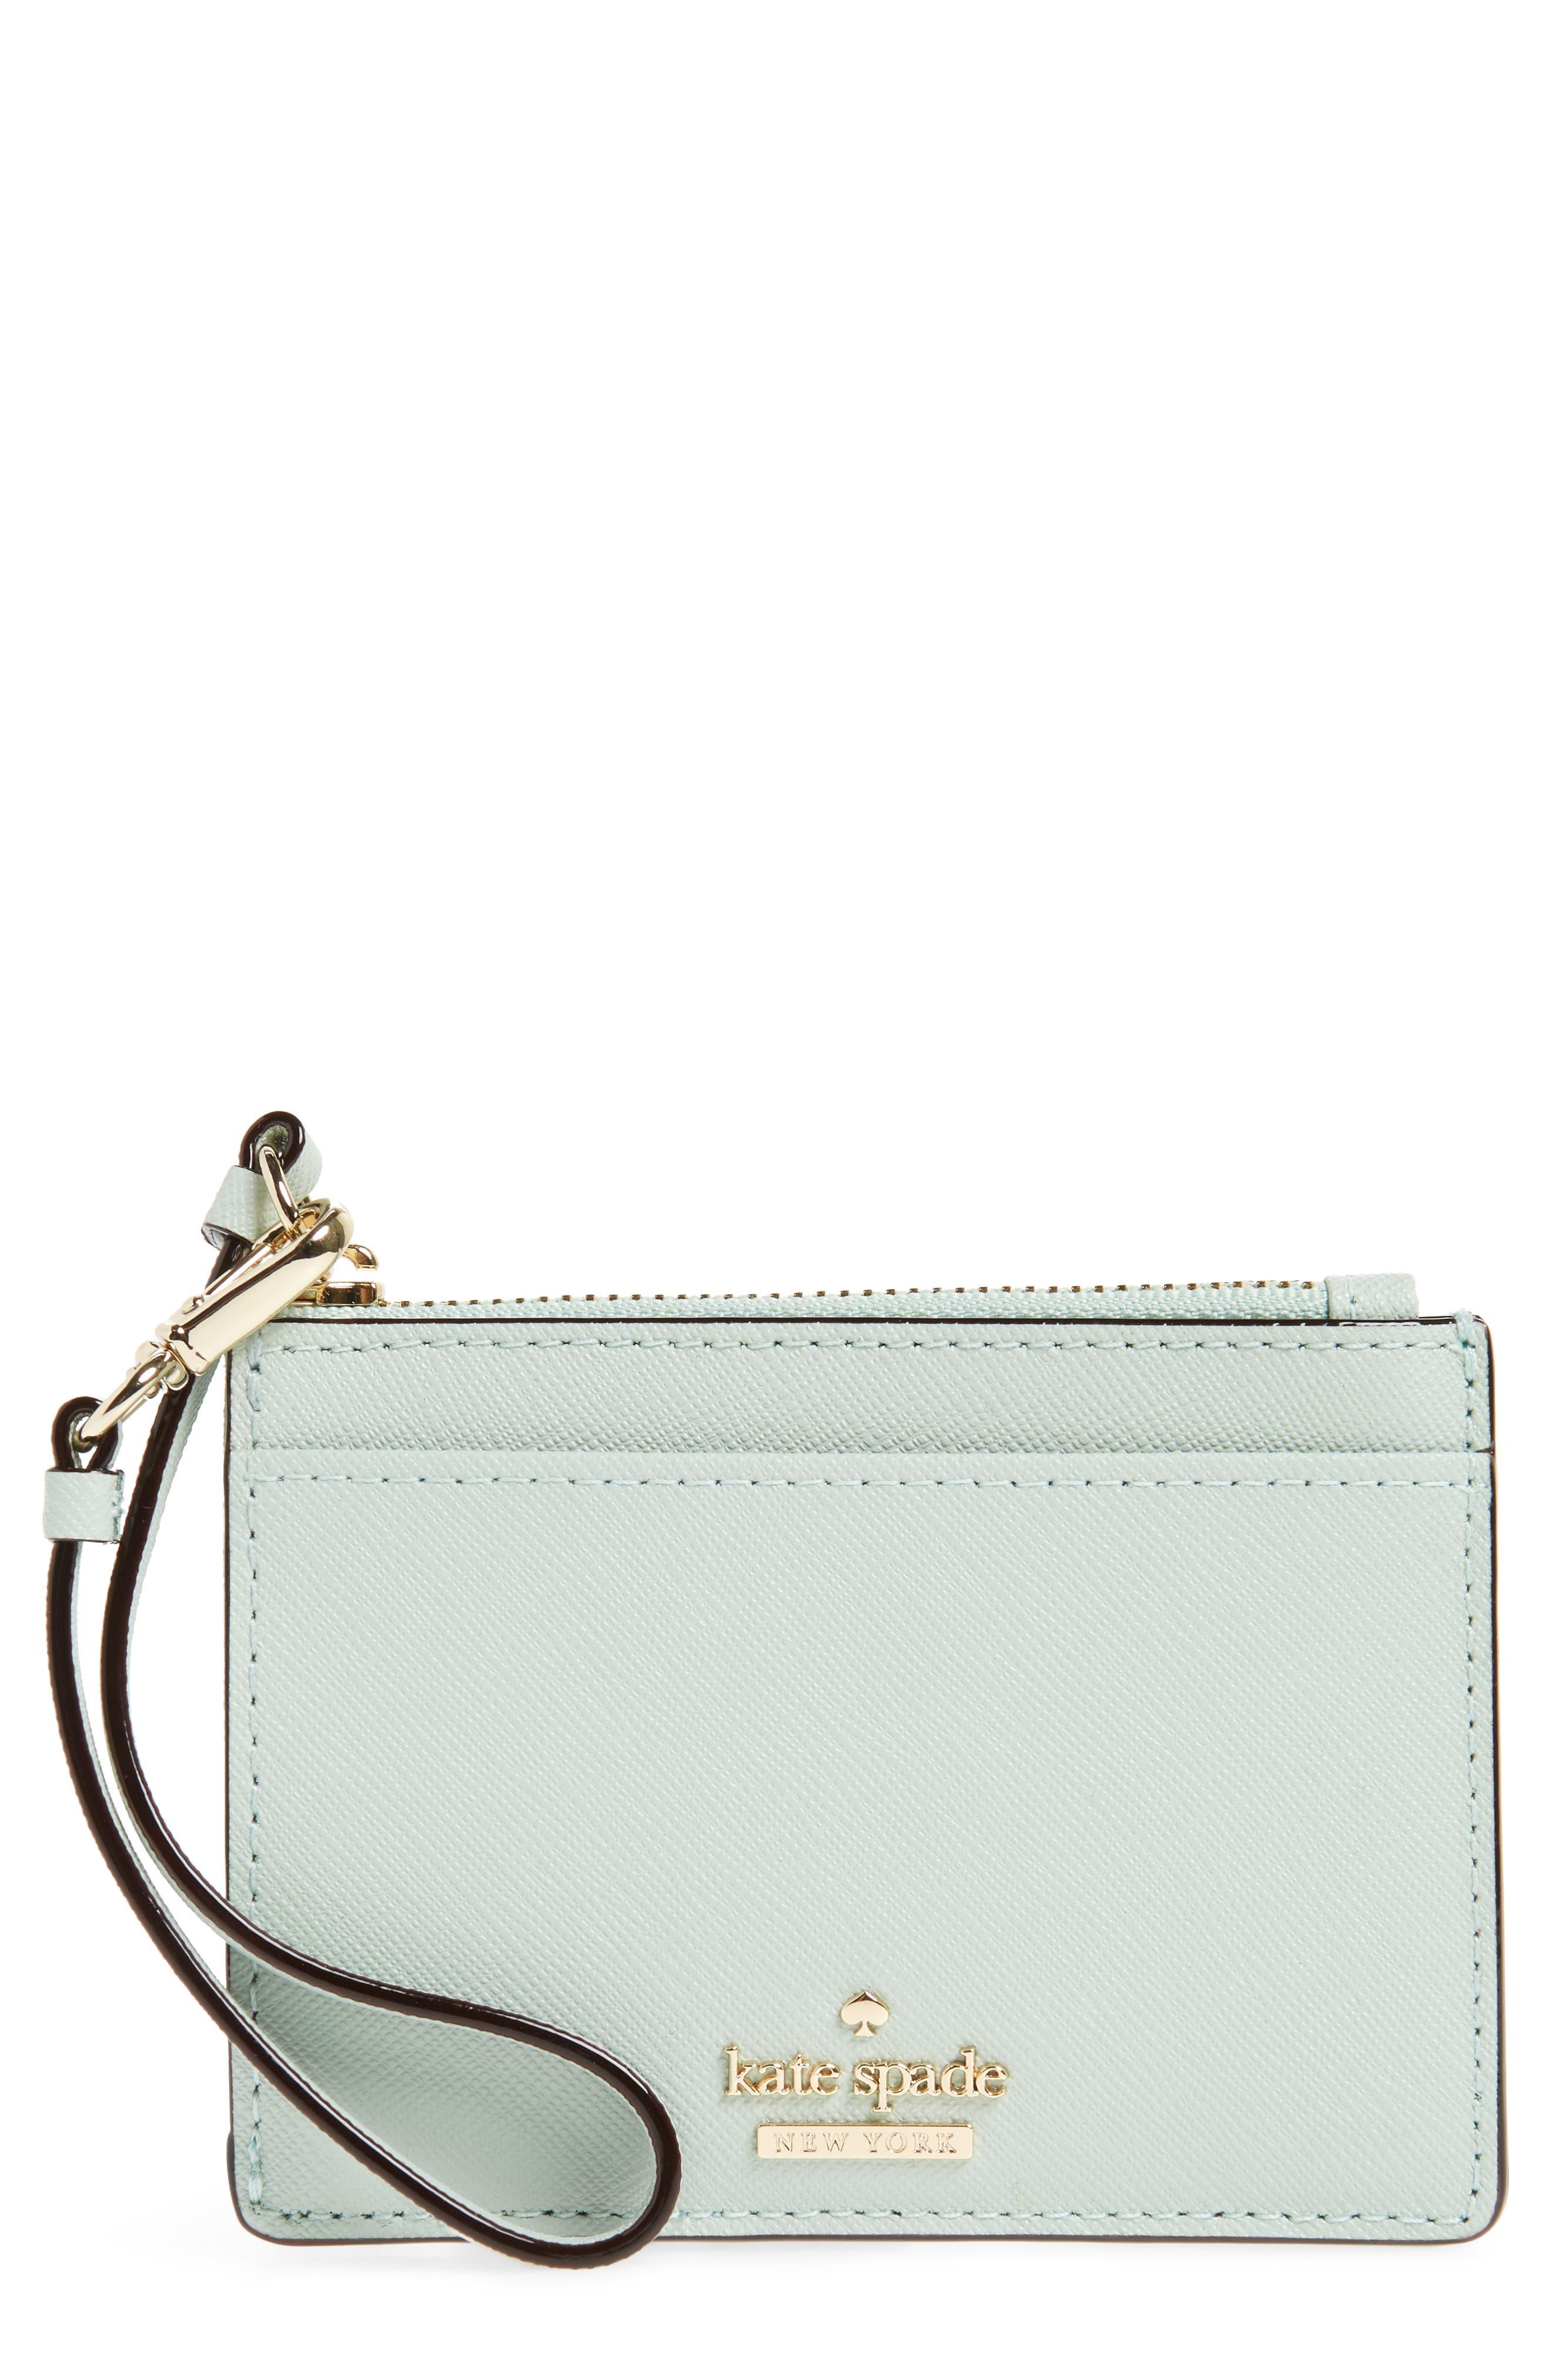 kate spade new york cameron street - mellody leather card case